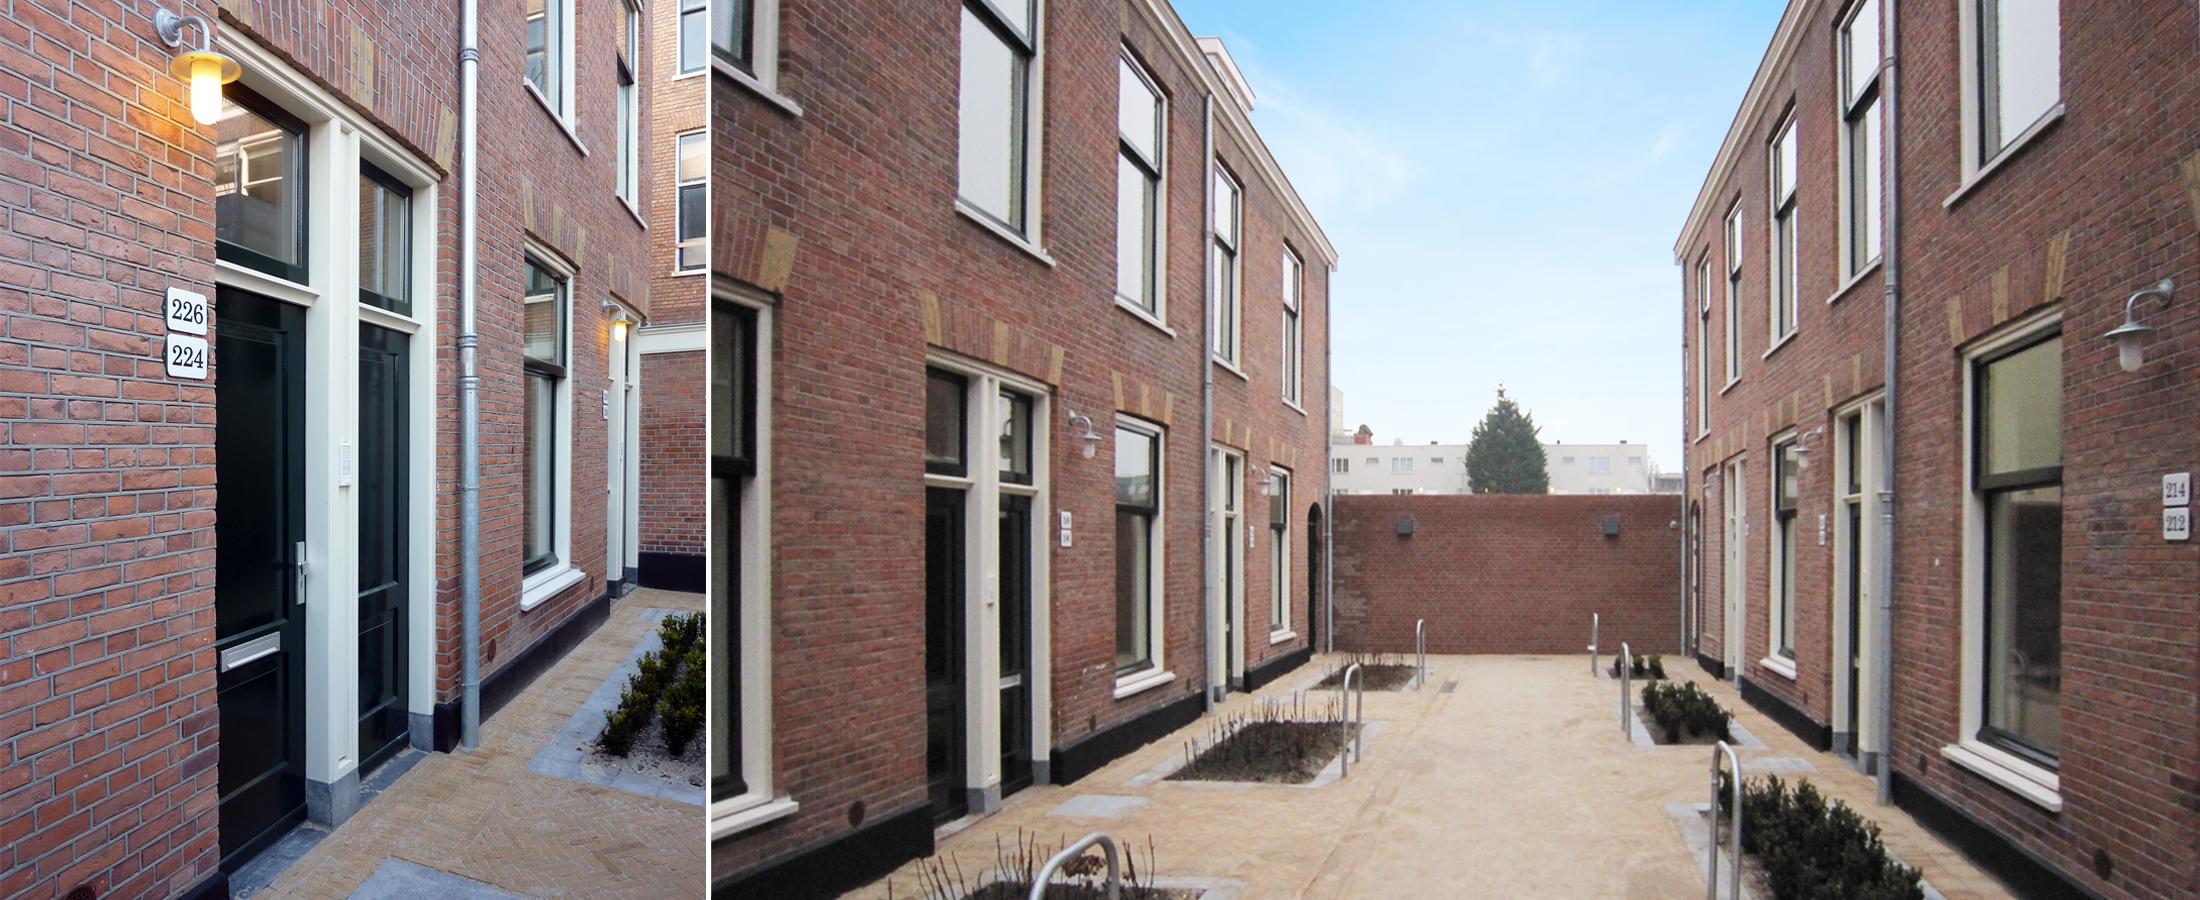 Studentenwoningen Prinsengrachthofje, Den Haag